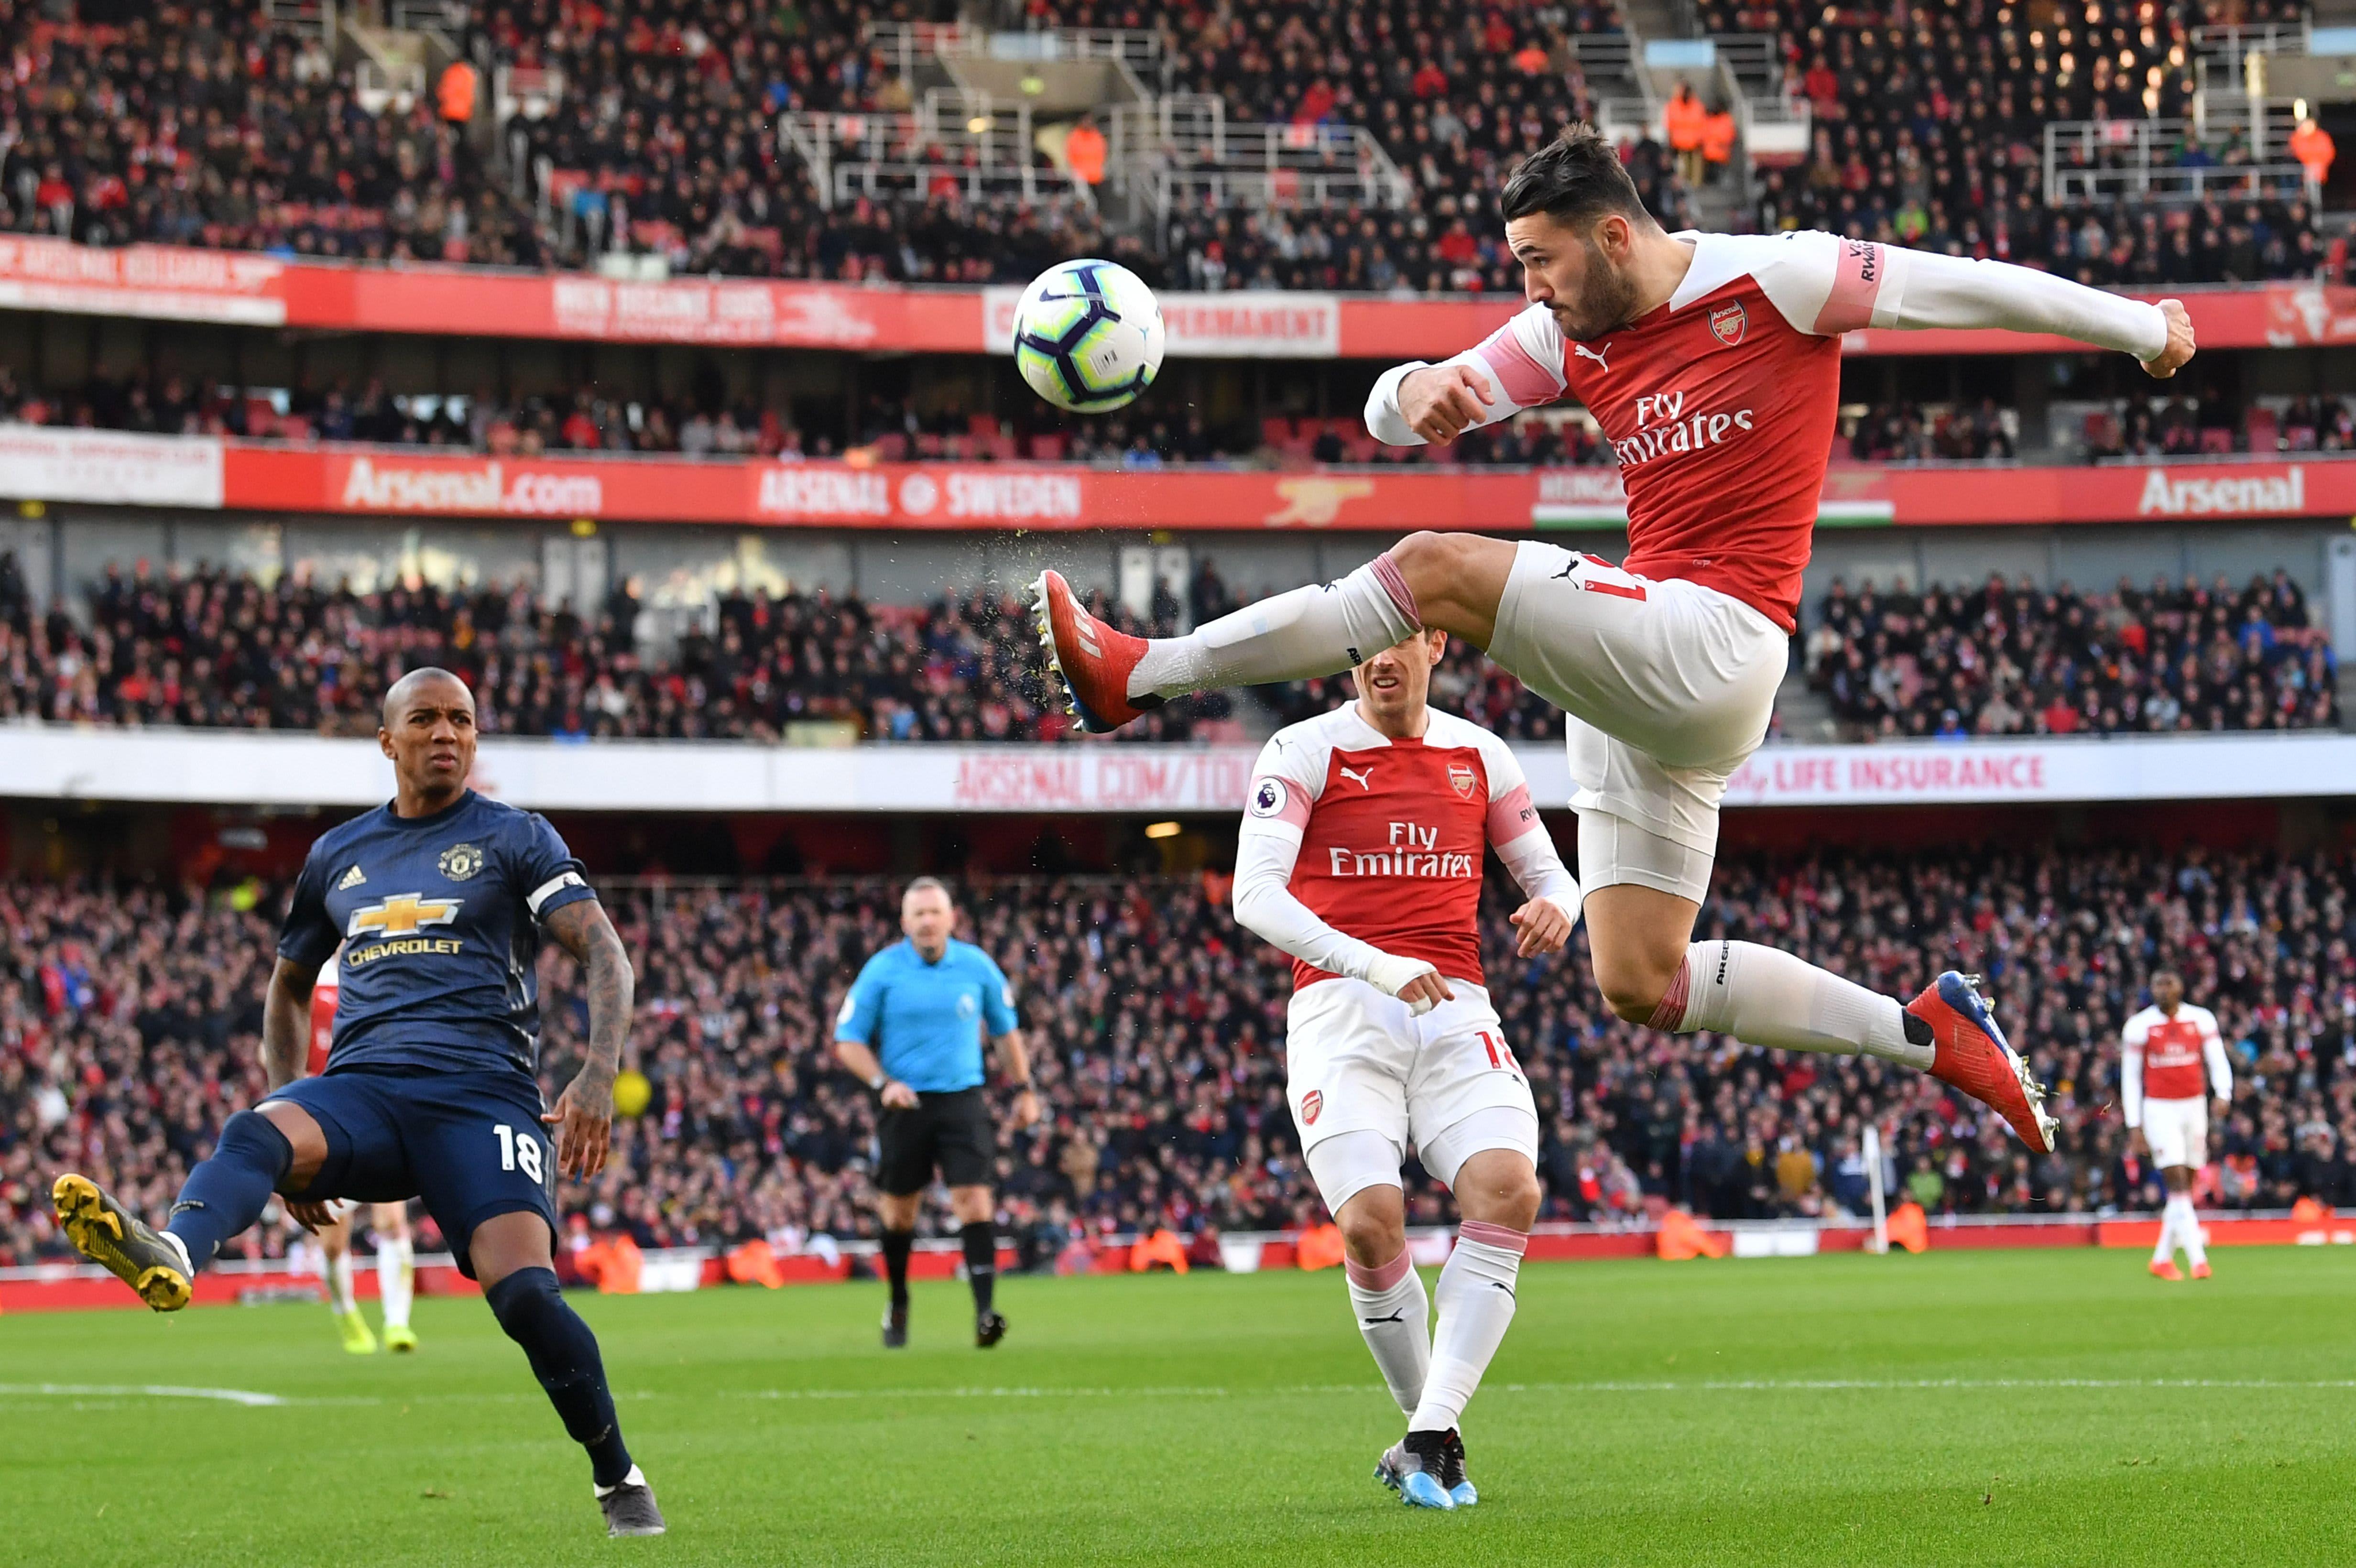 Arsenal: Spotify owner Daniel Ek to present 'very compelling offer' to Kroenke family